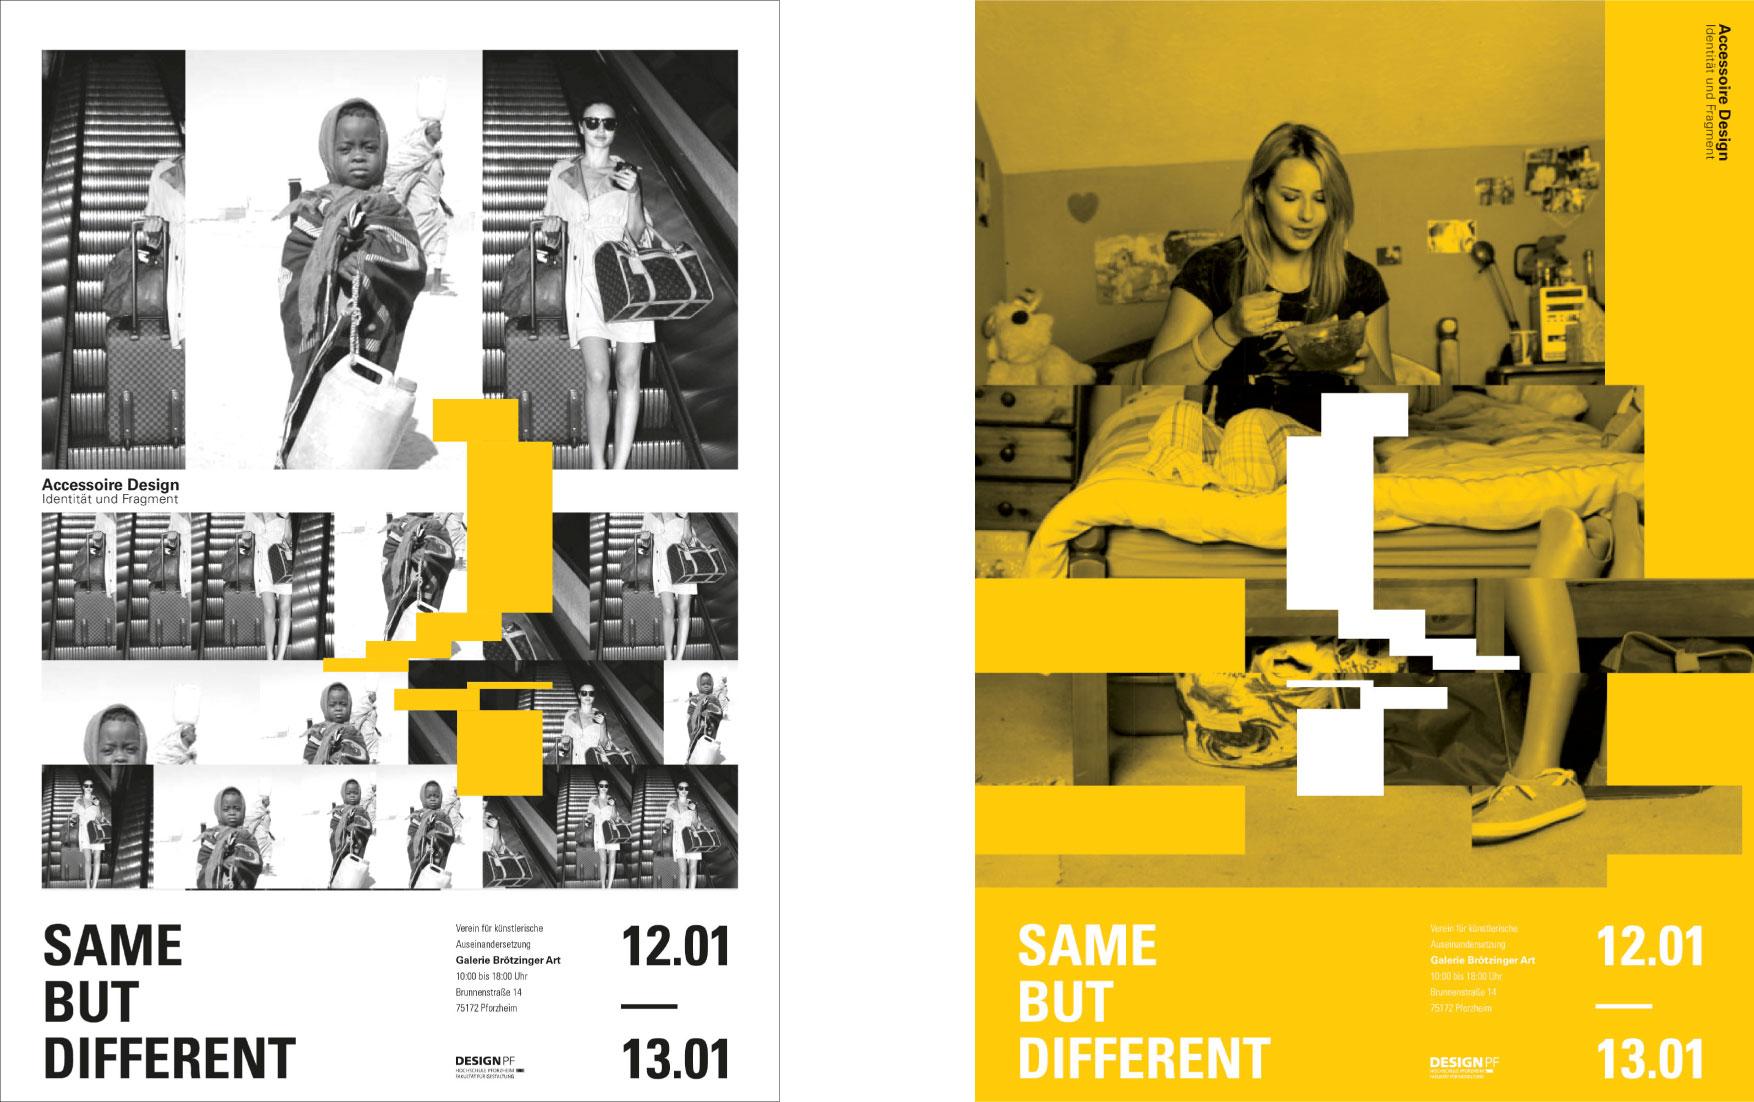 gerrit_schweiger-Nice_to_have-Must_have-unreachable-Accessoire-Accessory-Designprozess-Design_Thinking-Social_Design-Ausstellung-CAD-Raum-Illustration-Skulptur-Plakat-Typographie-Plakat-III